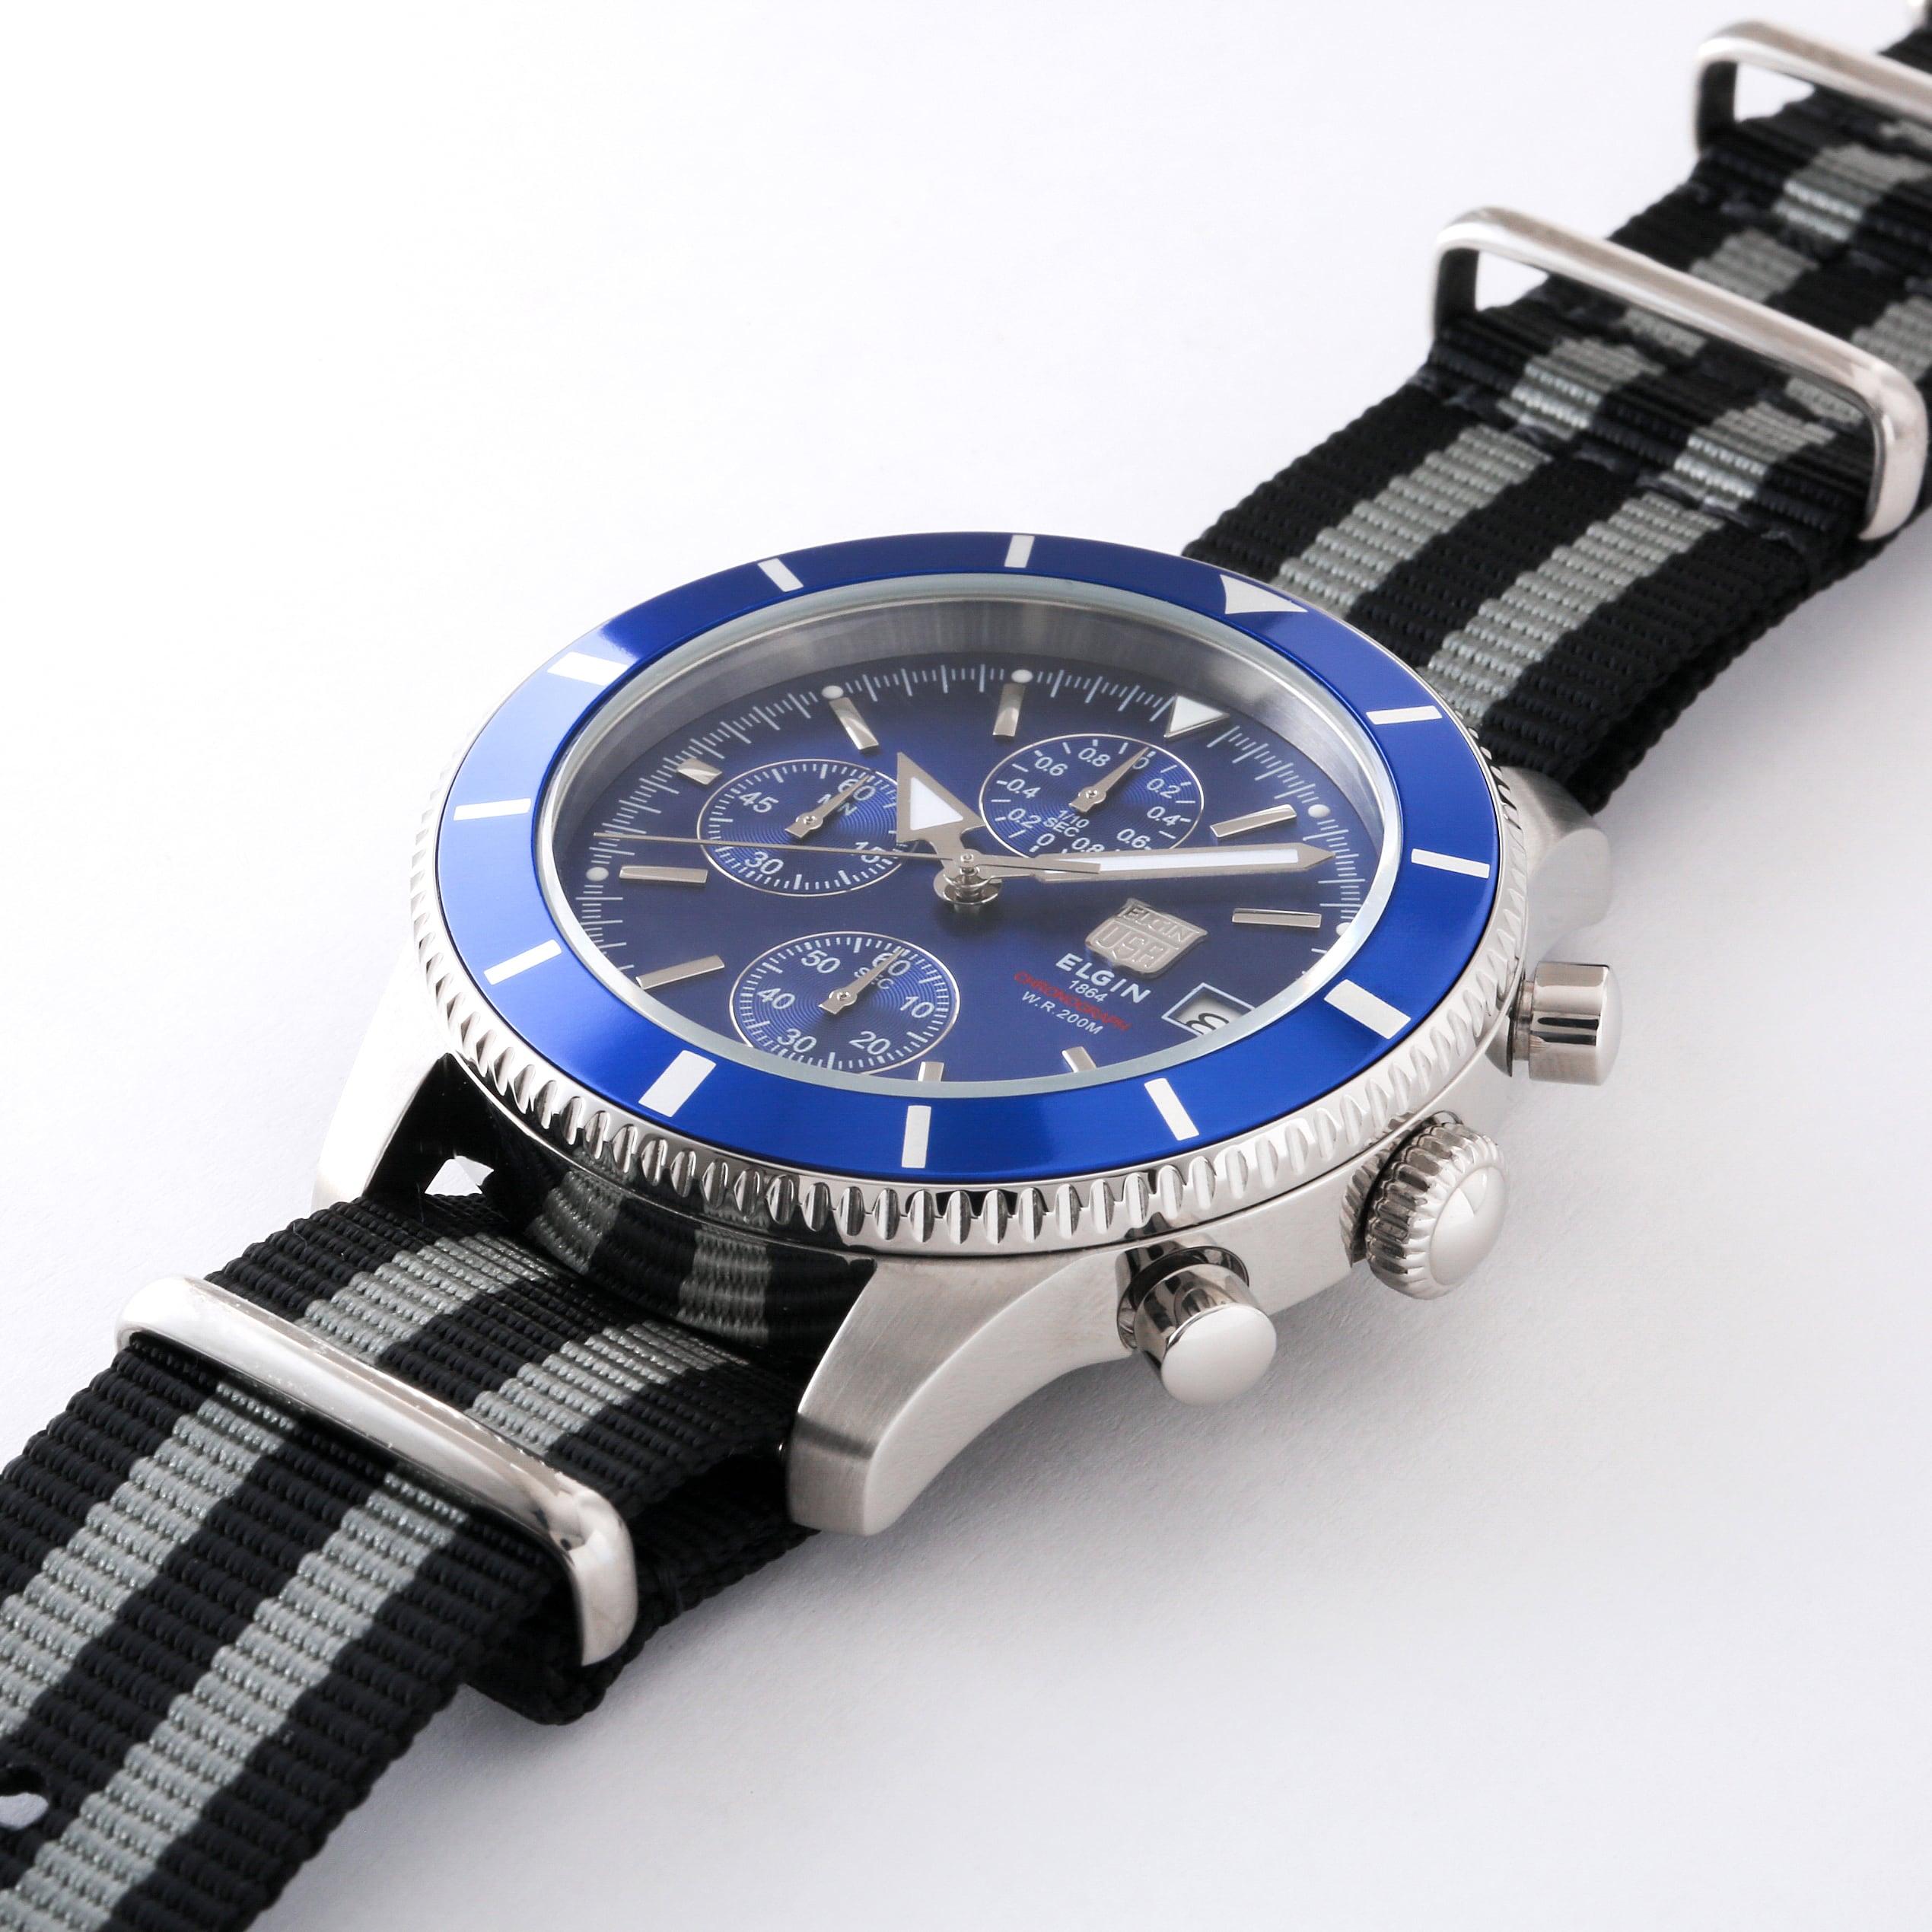 200M防水&機能的な腕時計 C004